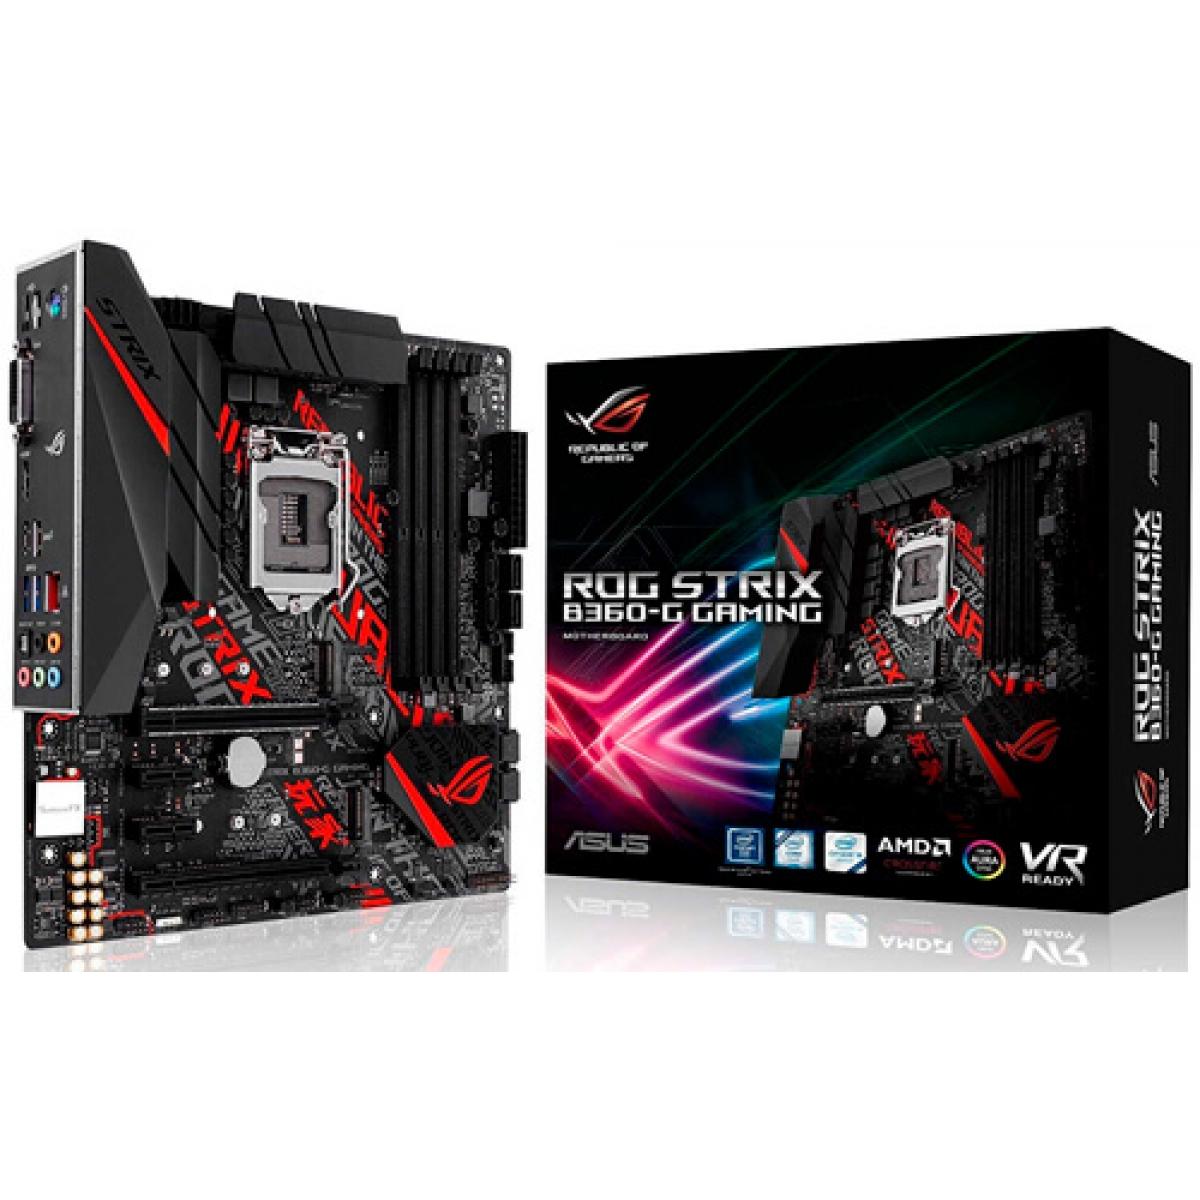 Placa Mãe Asus ROG STRIX B360-G GAMING, Chipset B360, Intel LGA 1151, mATX, DDR4